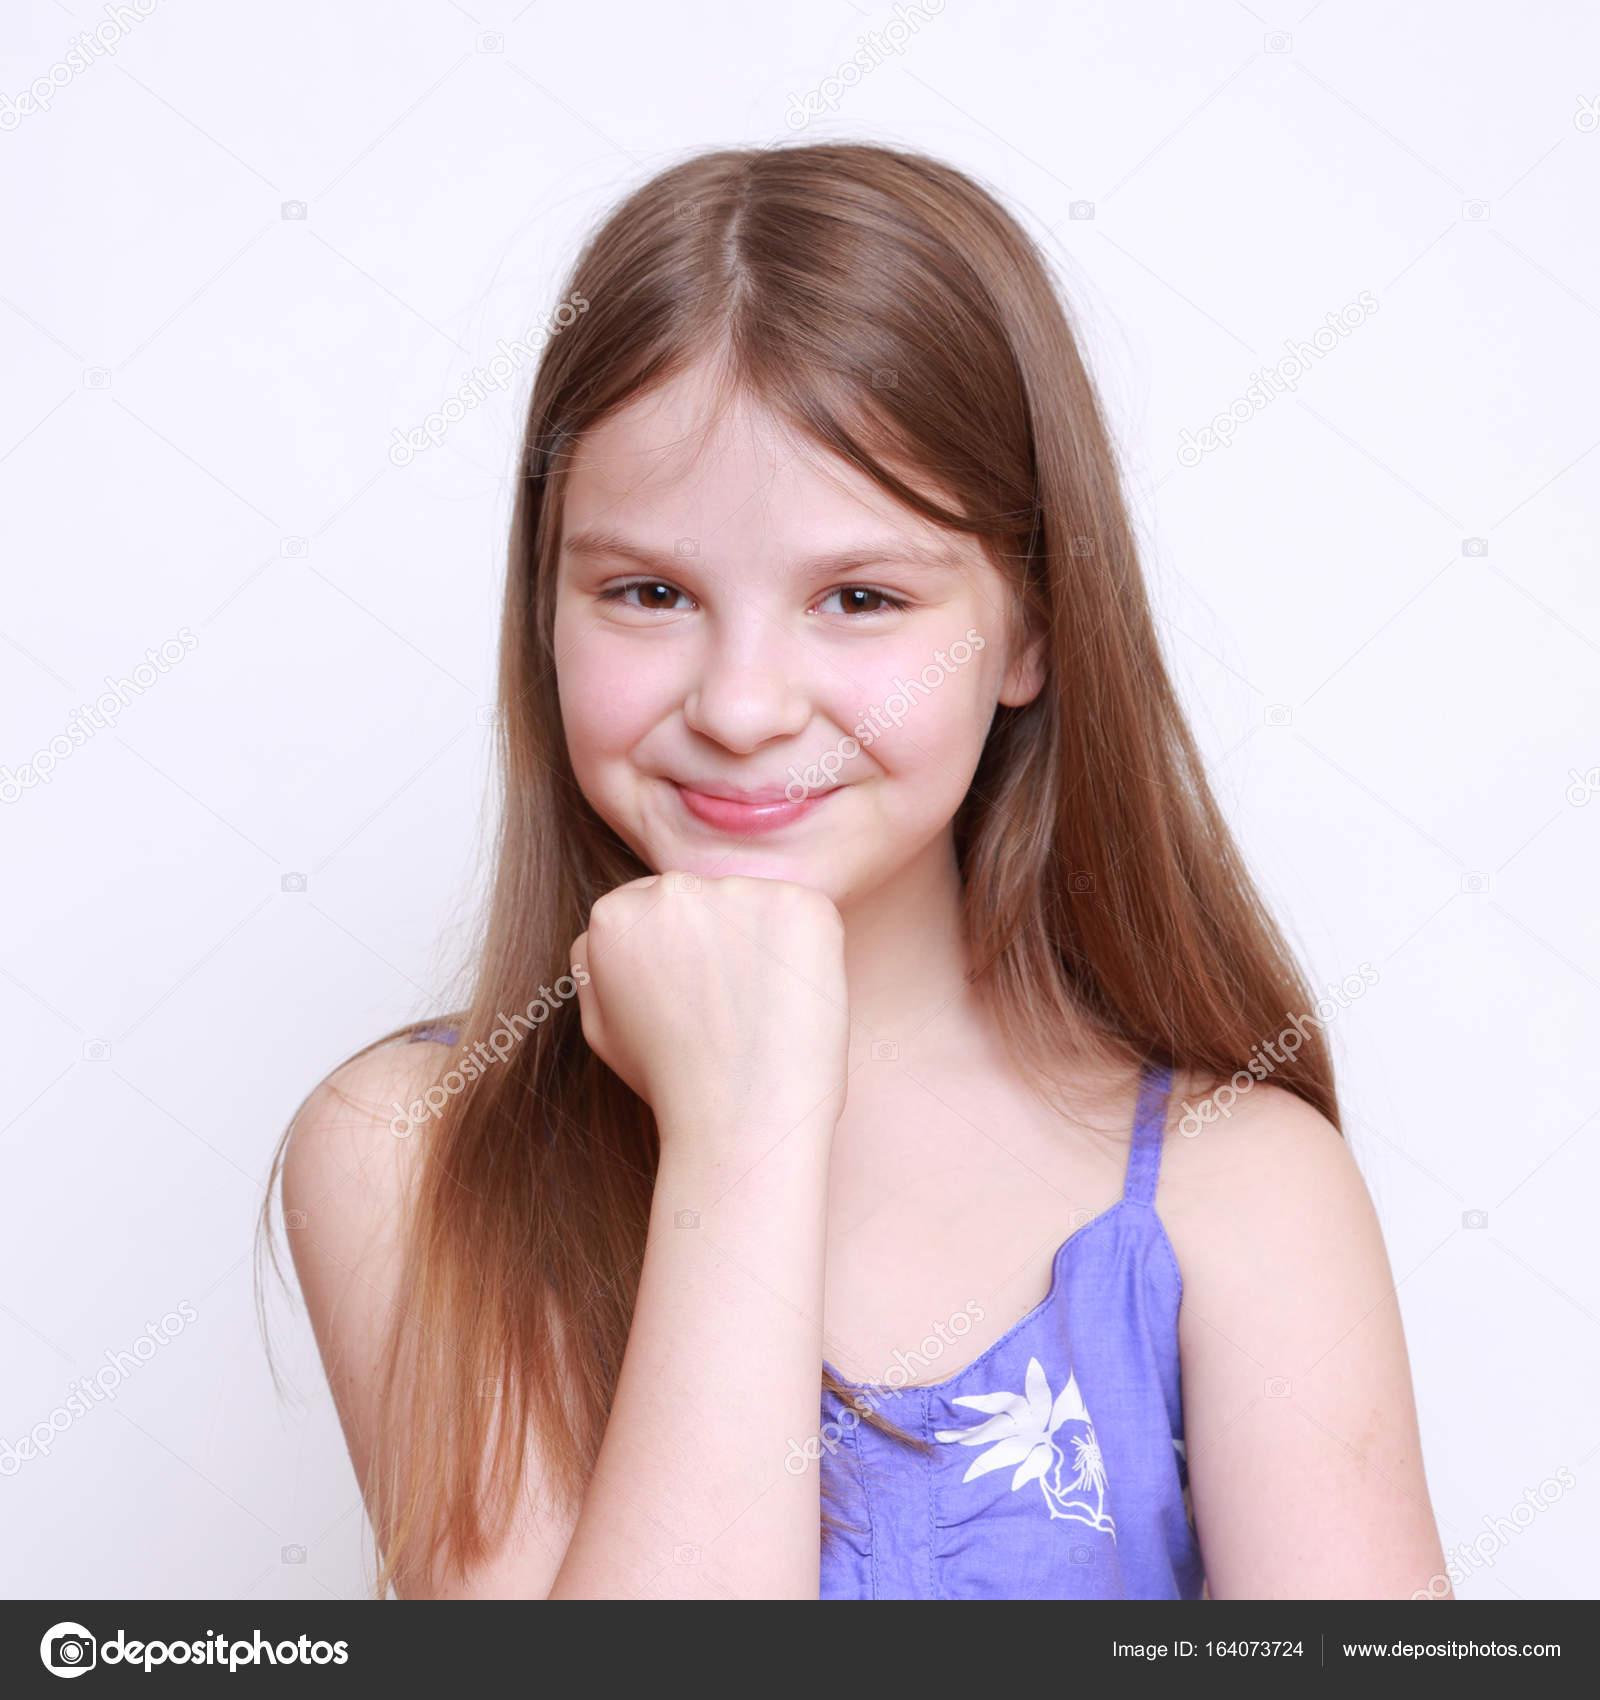 Useful Cute teen girl portrait consider, what